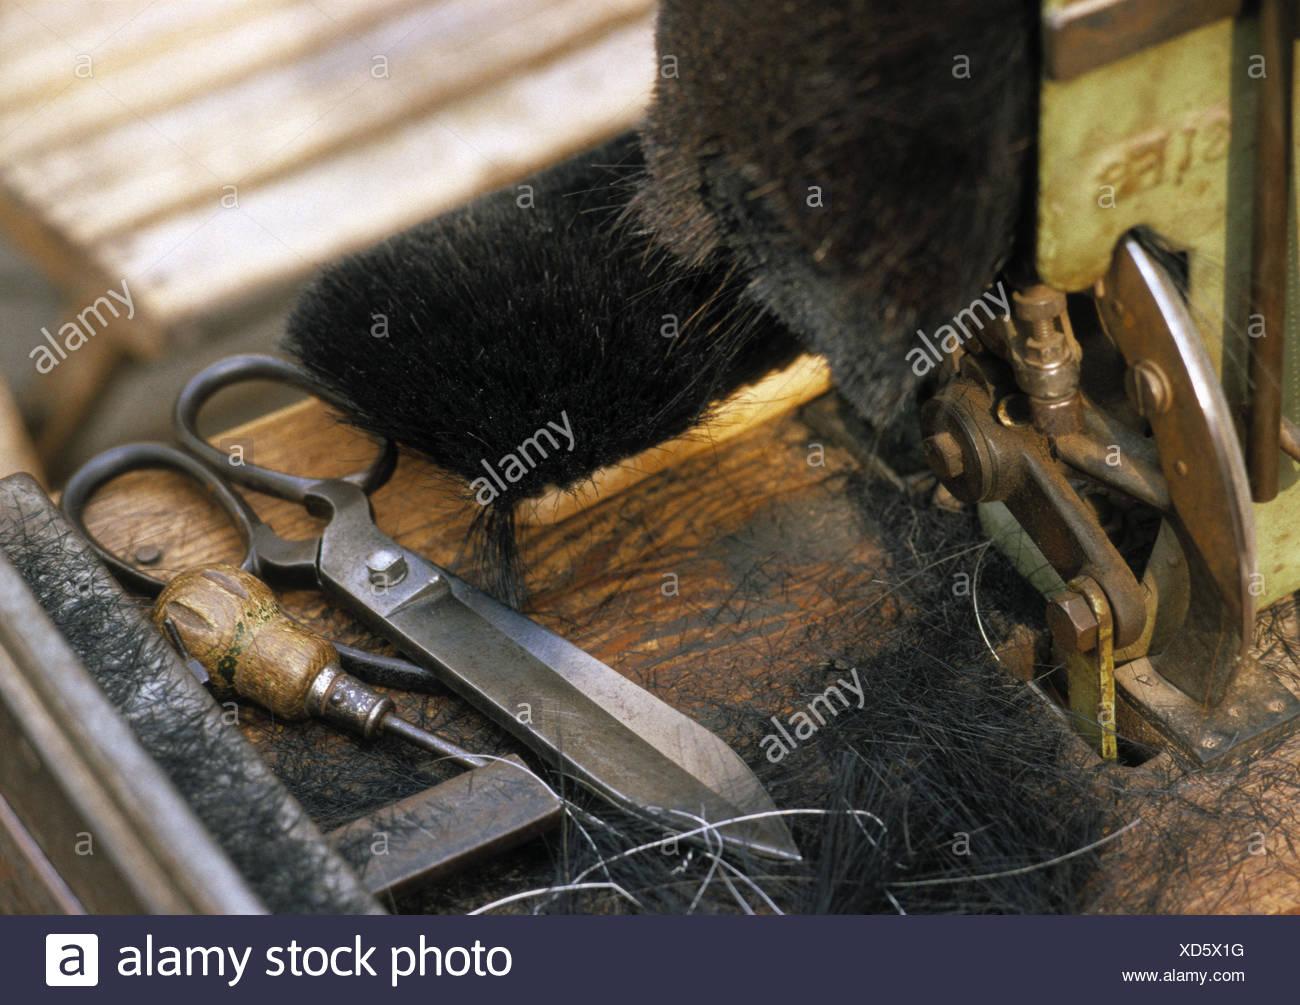 Broom Machine Stock Photos & Broom Machine Stock Images - Alamy